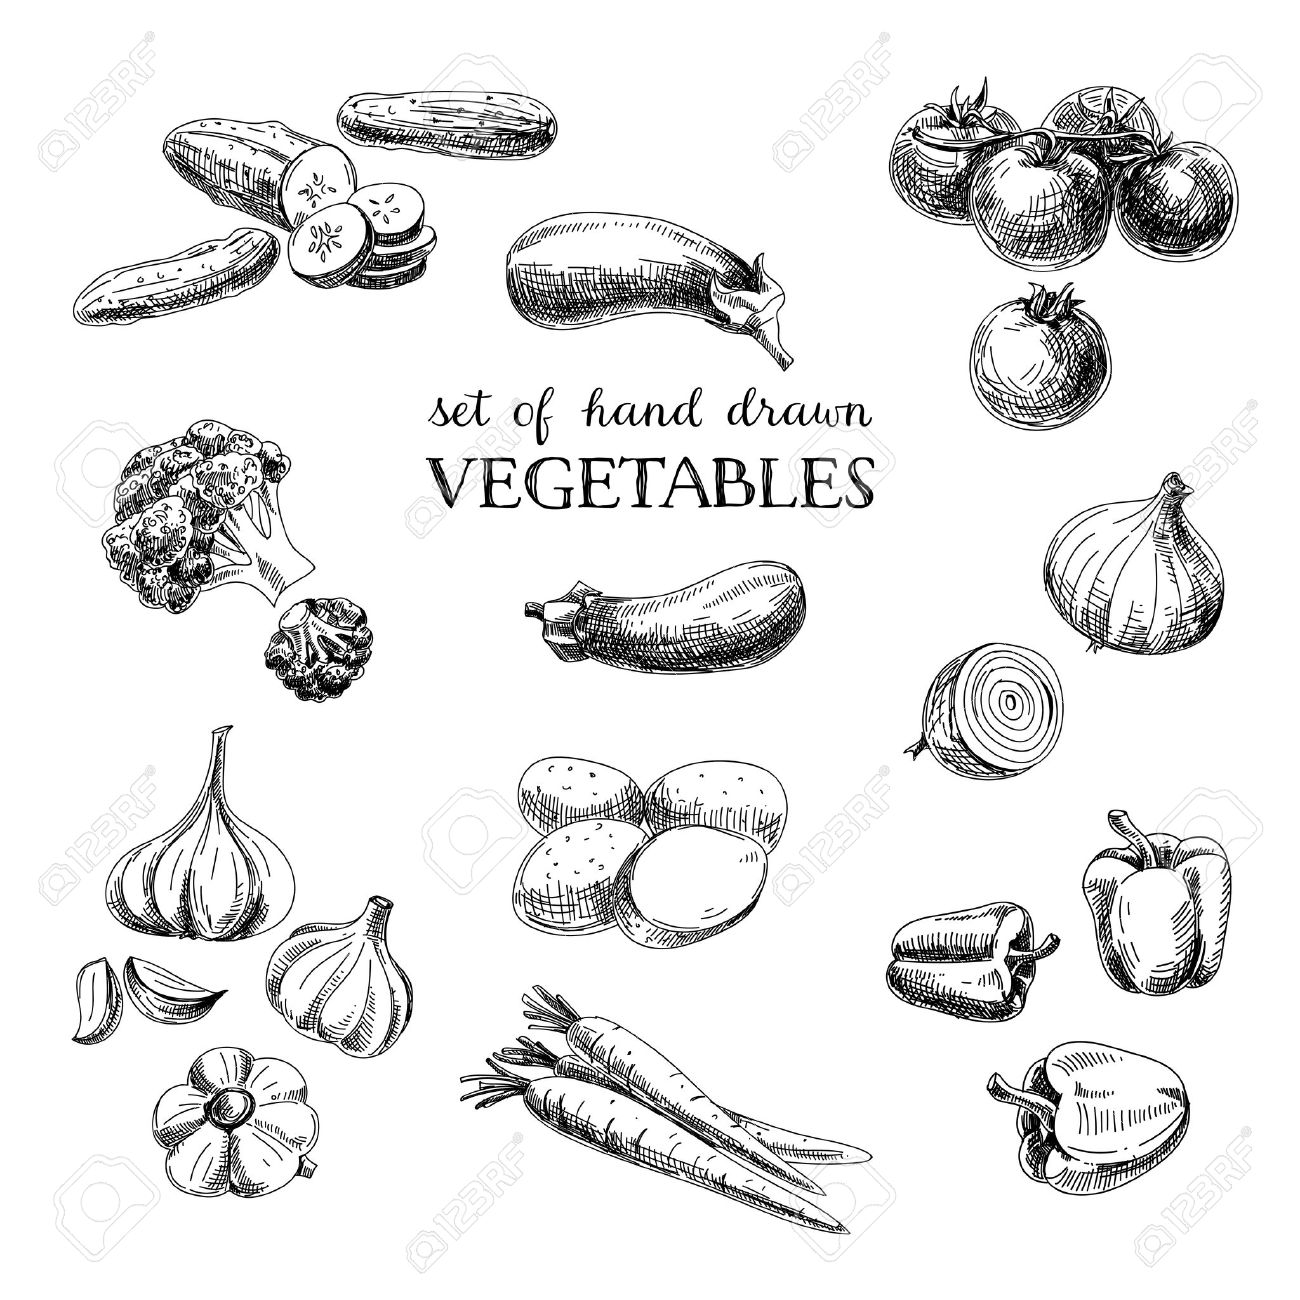 Vector hand drawn sketch vegetable set. Eco foods.Vector illustration. - 43333517